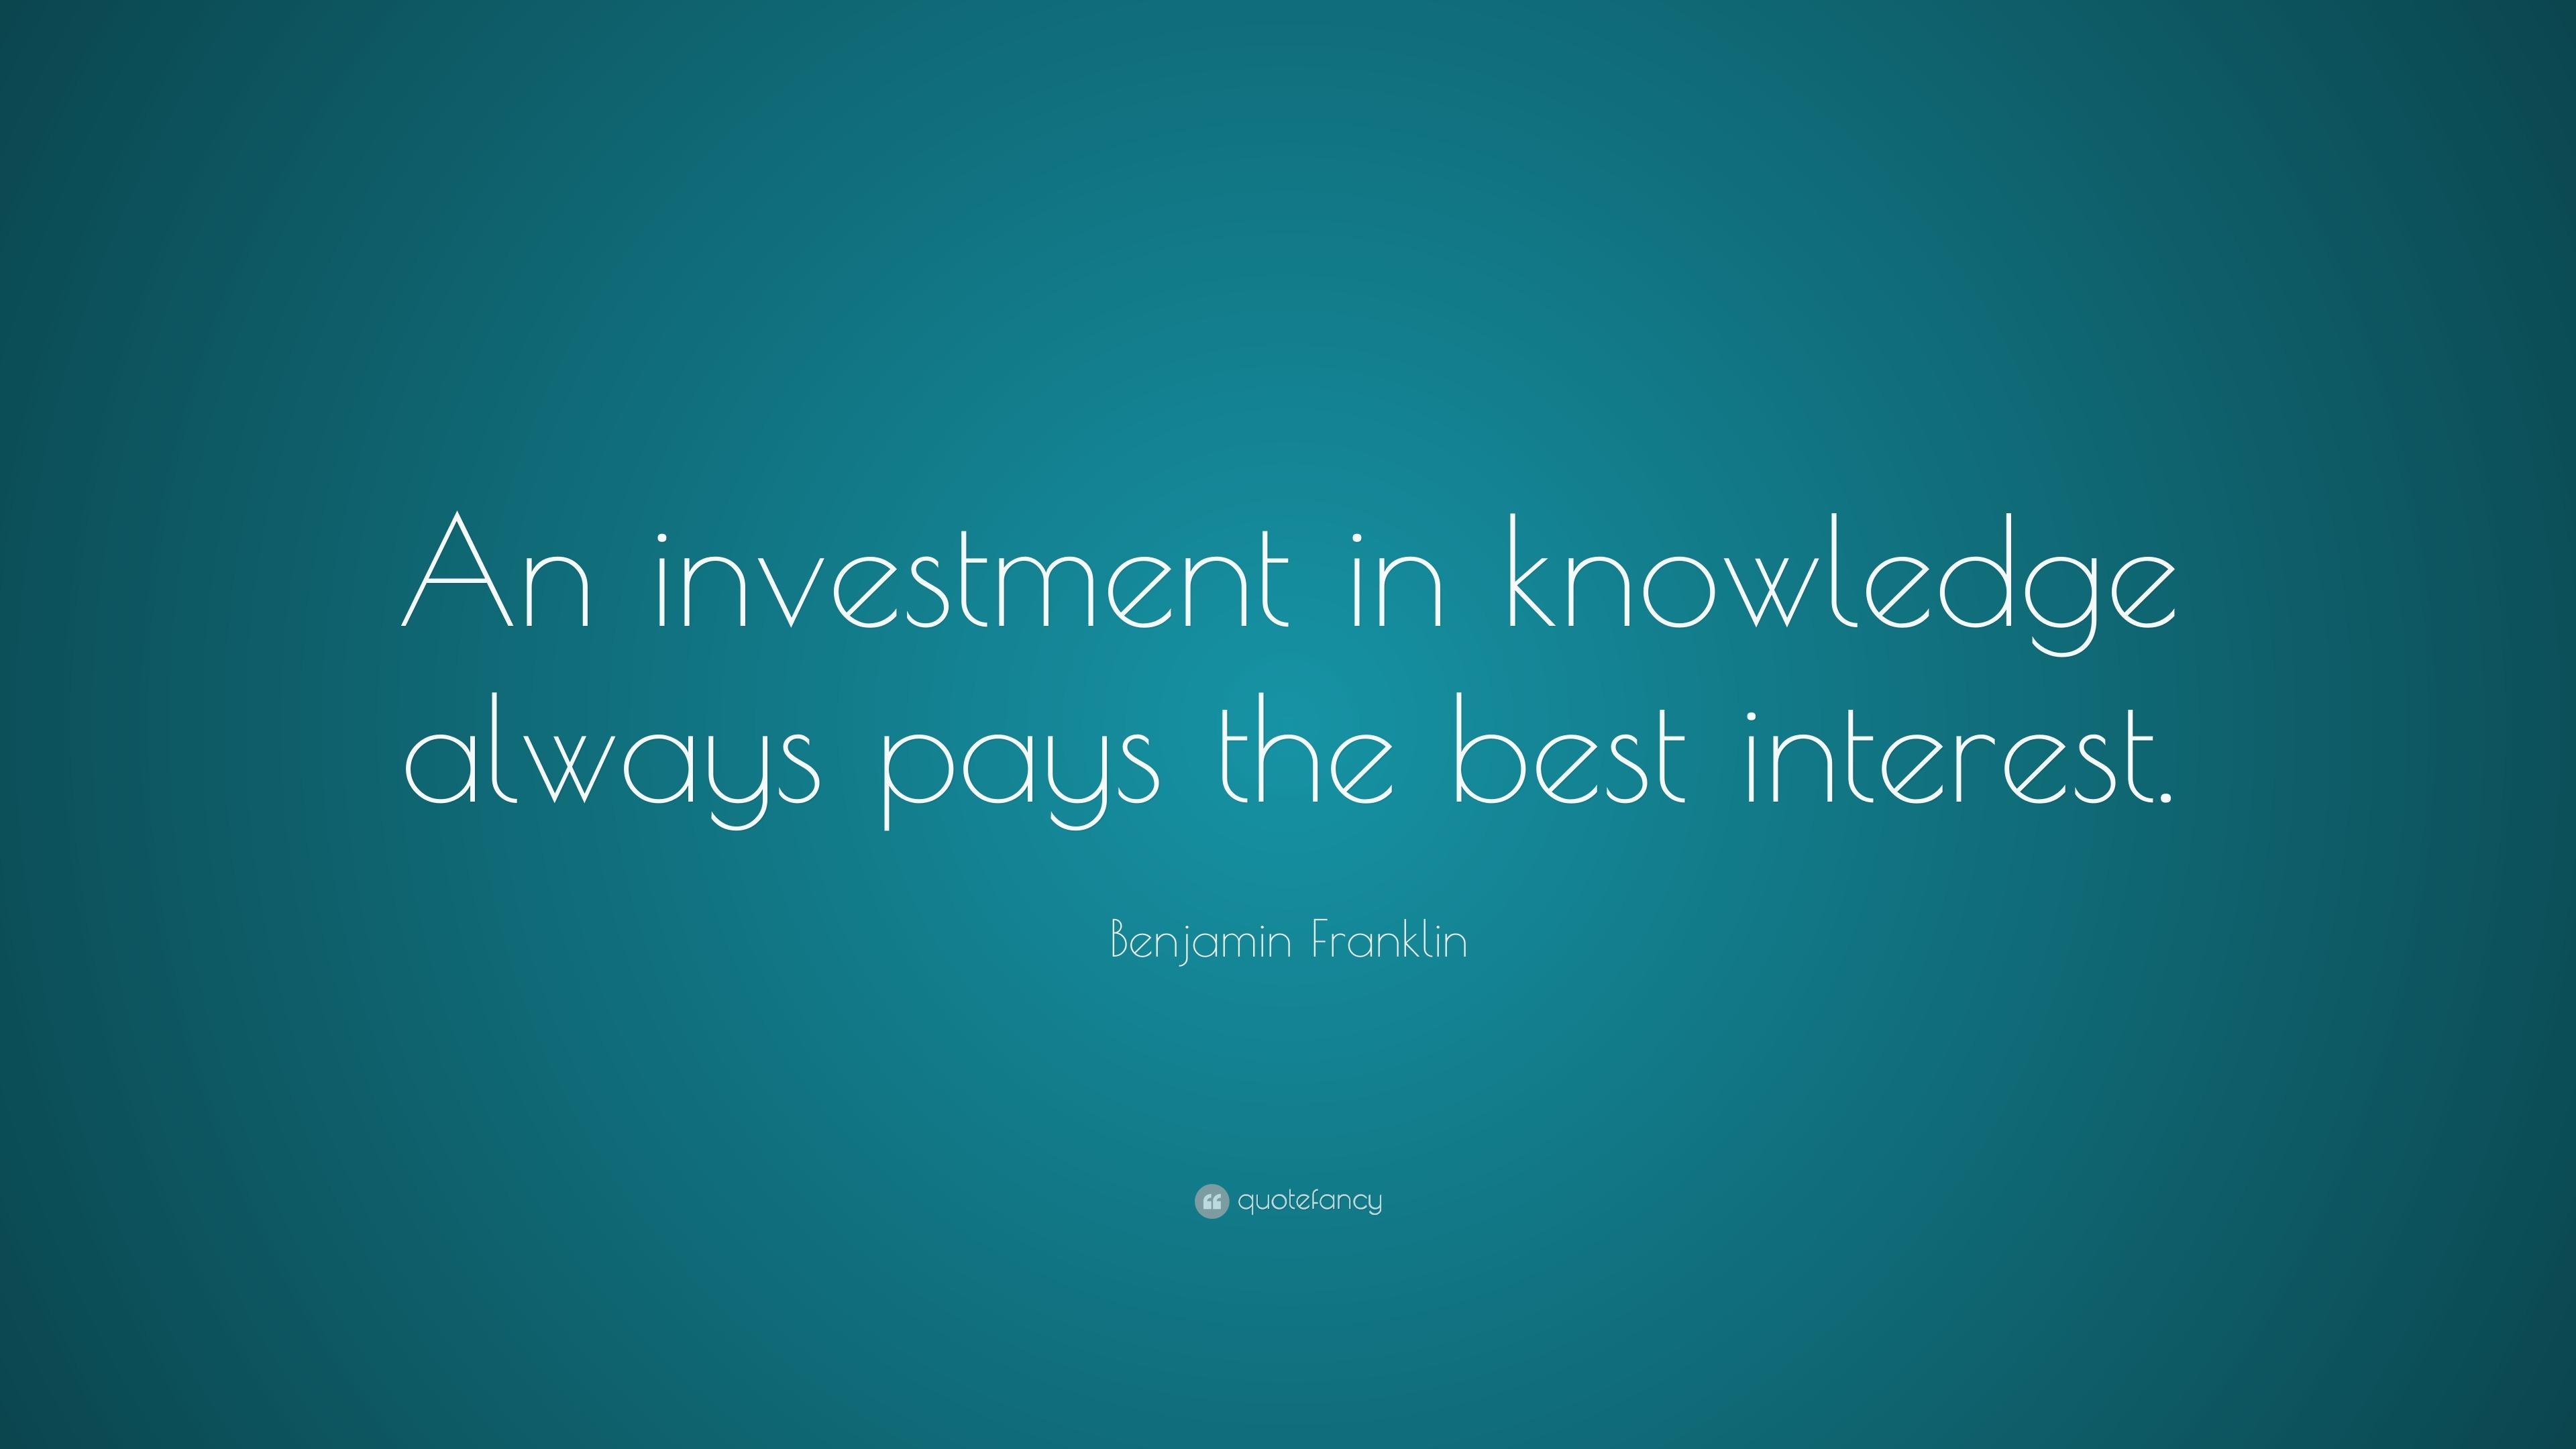 Investment quote